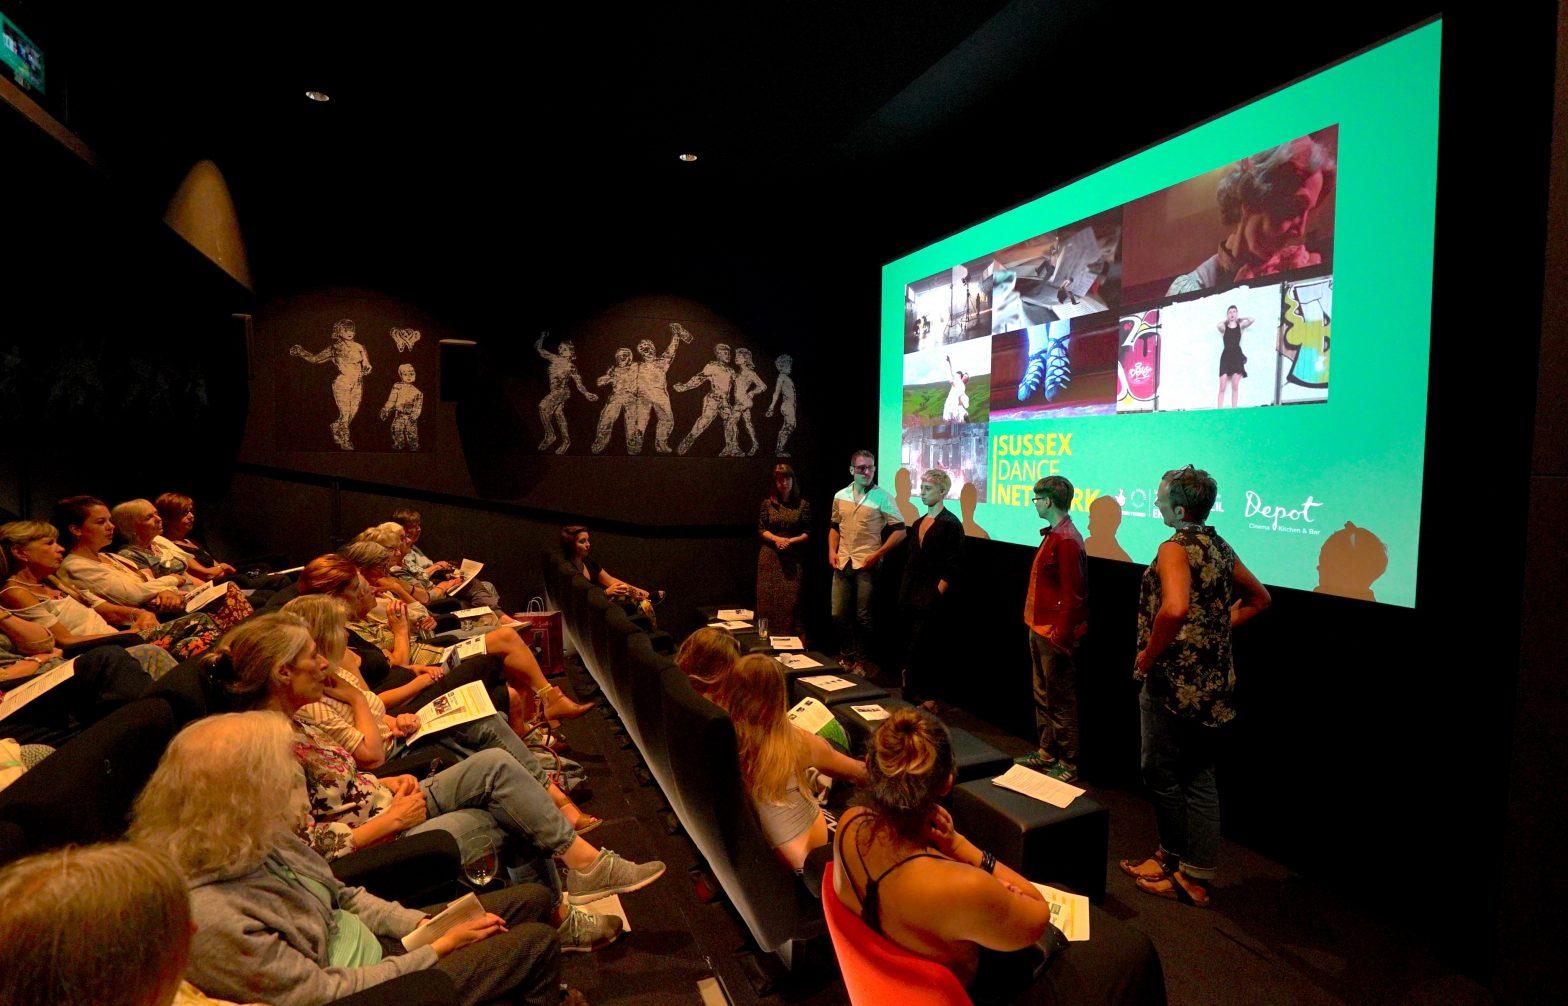 Presentation to an auditorium